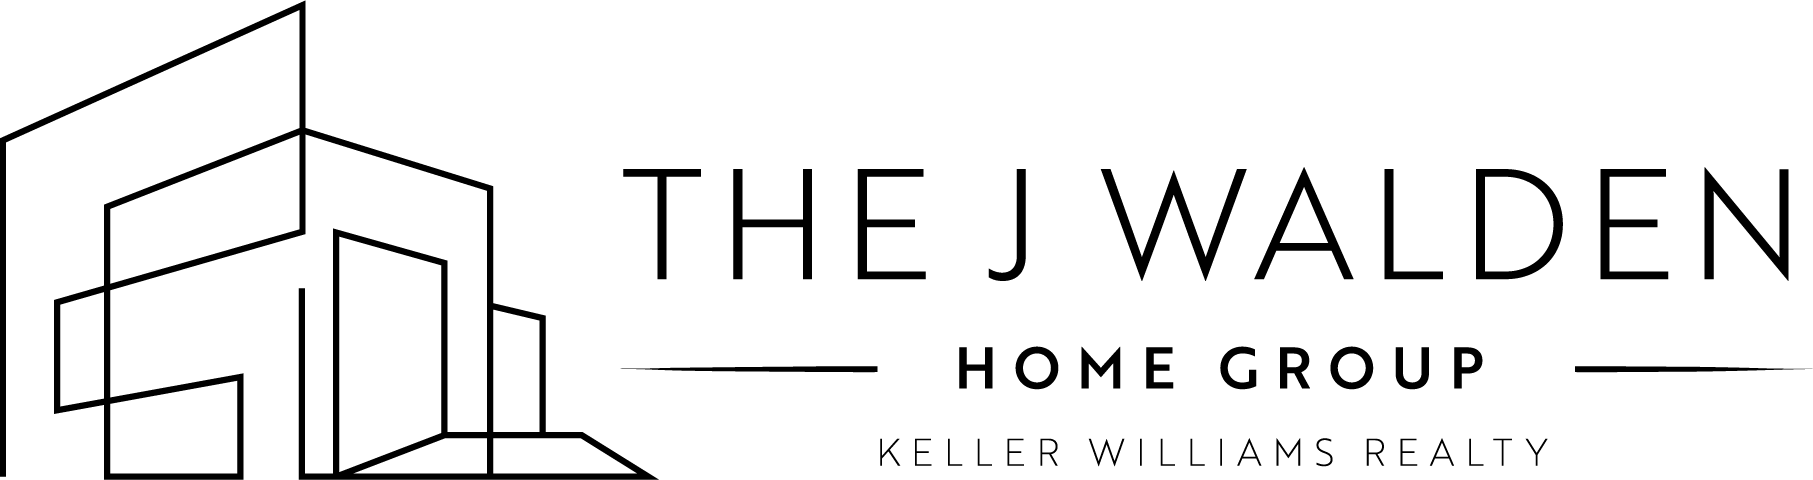 The J Walden Home Group of Keller Williams Realty logo